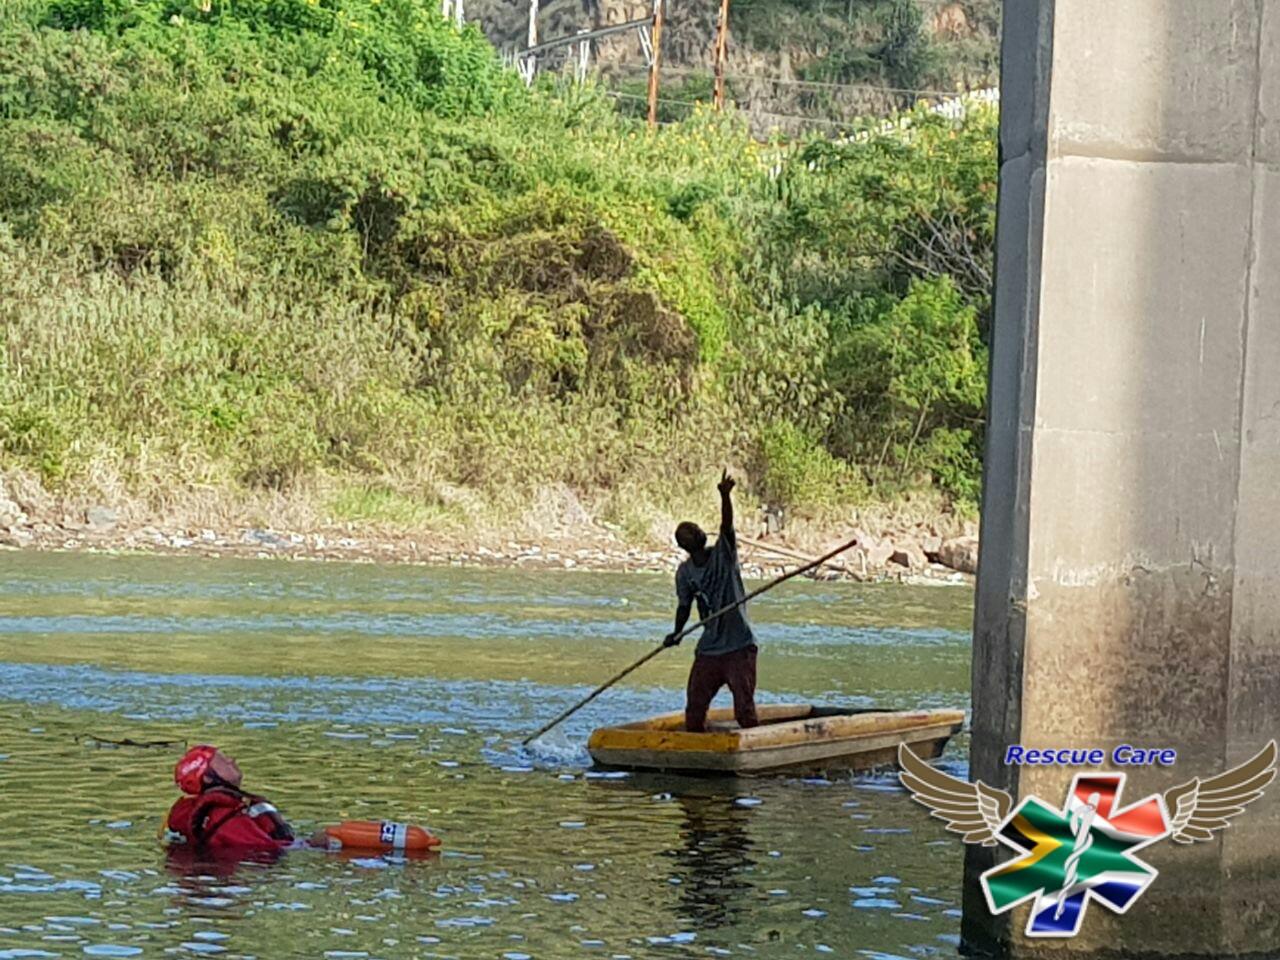 Man rescued after being stuck under Connaught Bridge